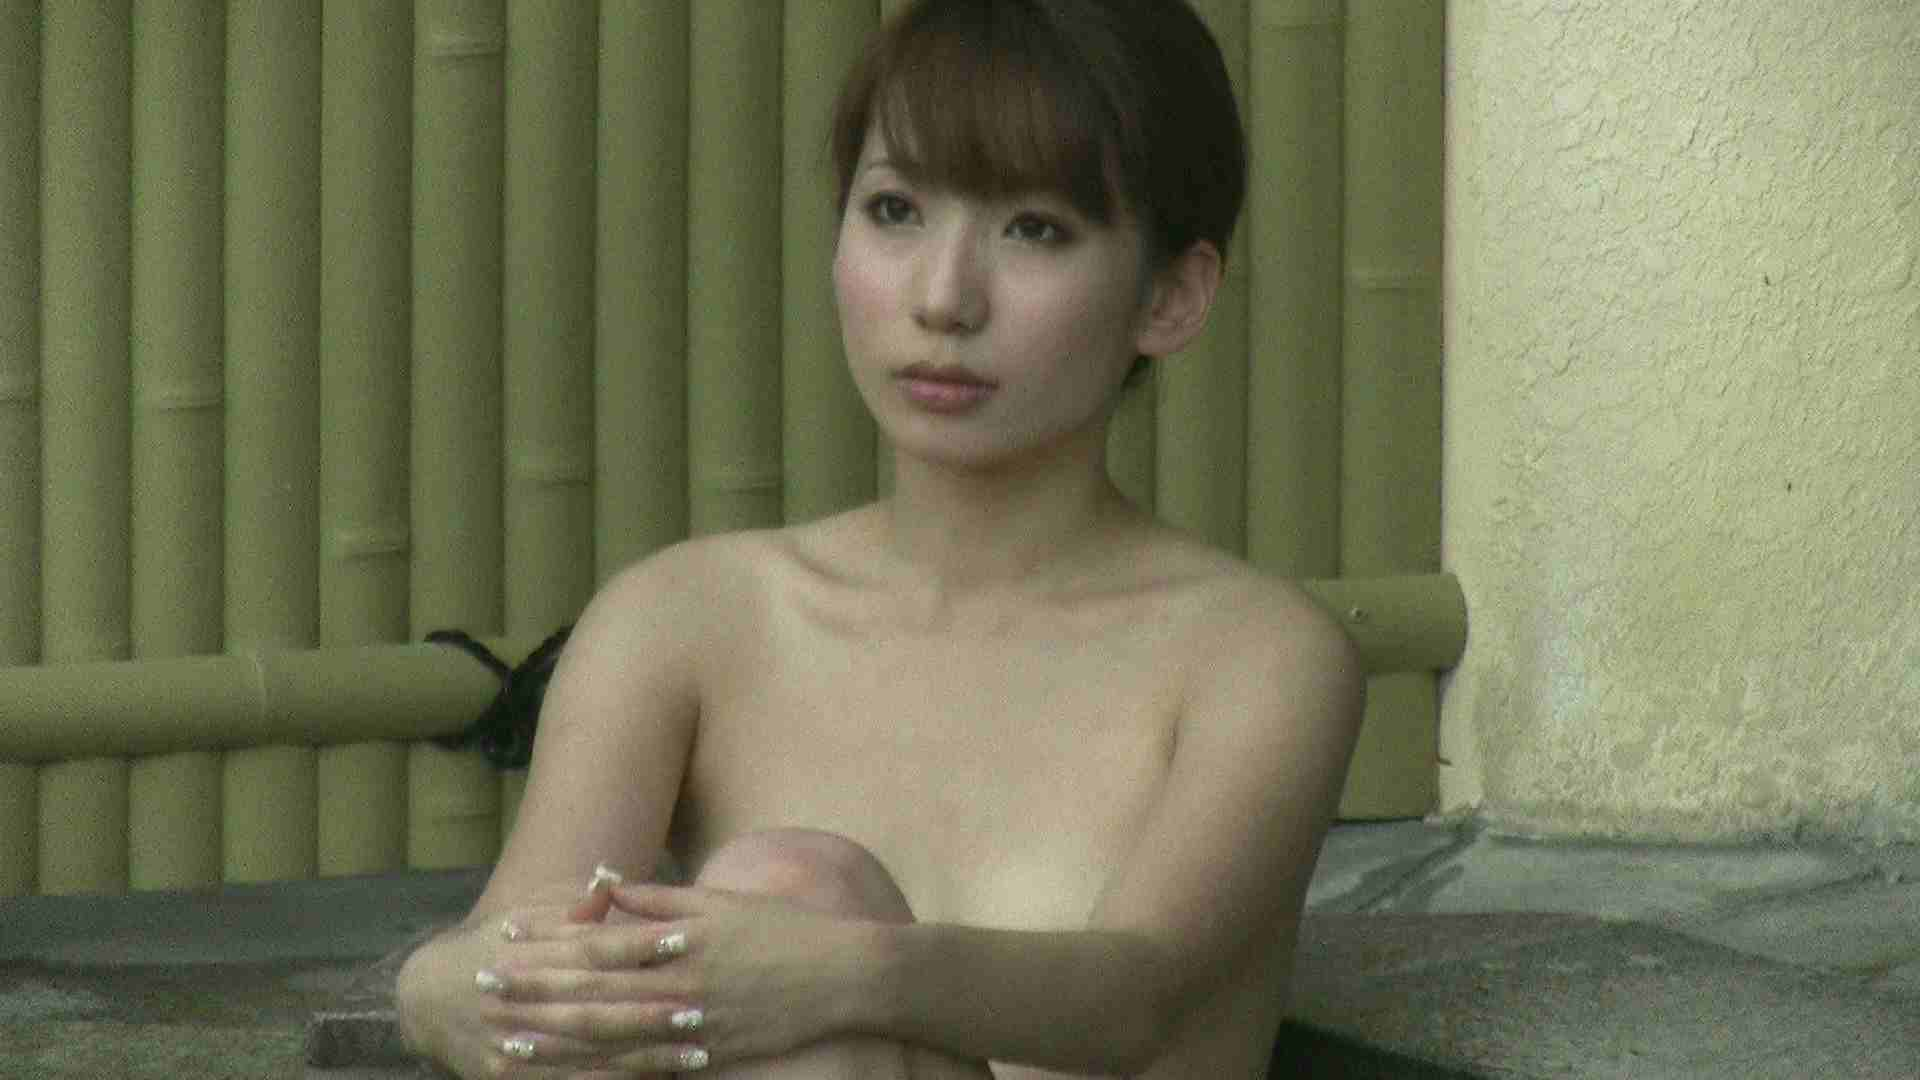 Aquaな露天風呂Vol.208 盗撮 隠し撮りオマンコ動画紹介 85画像 77